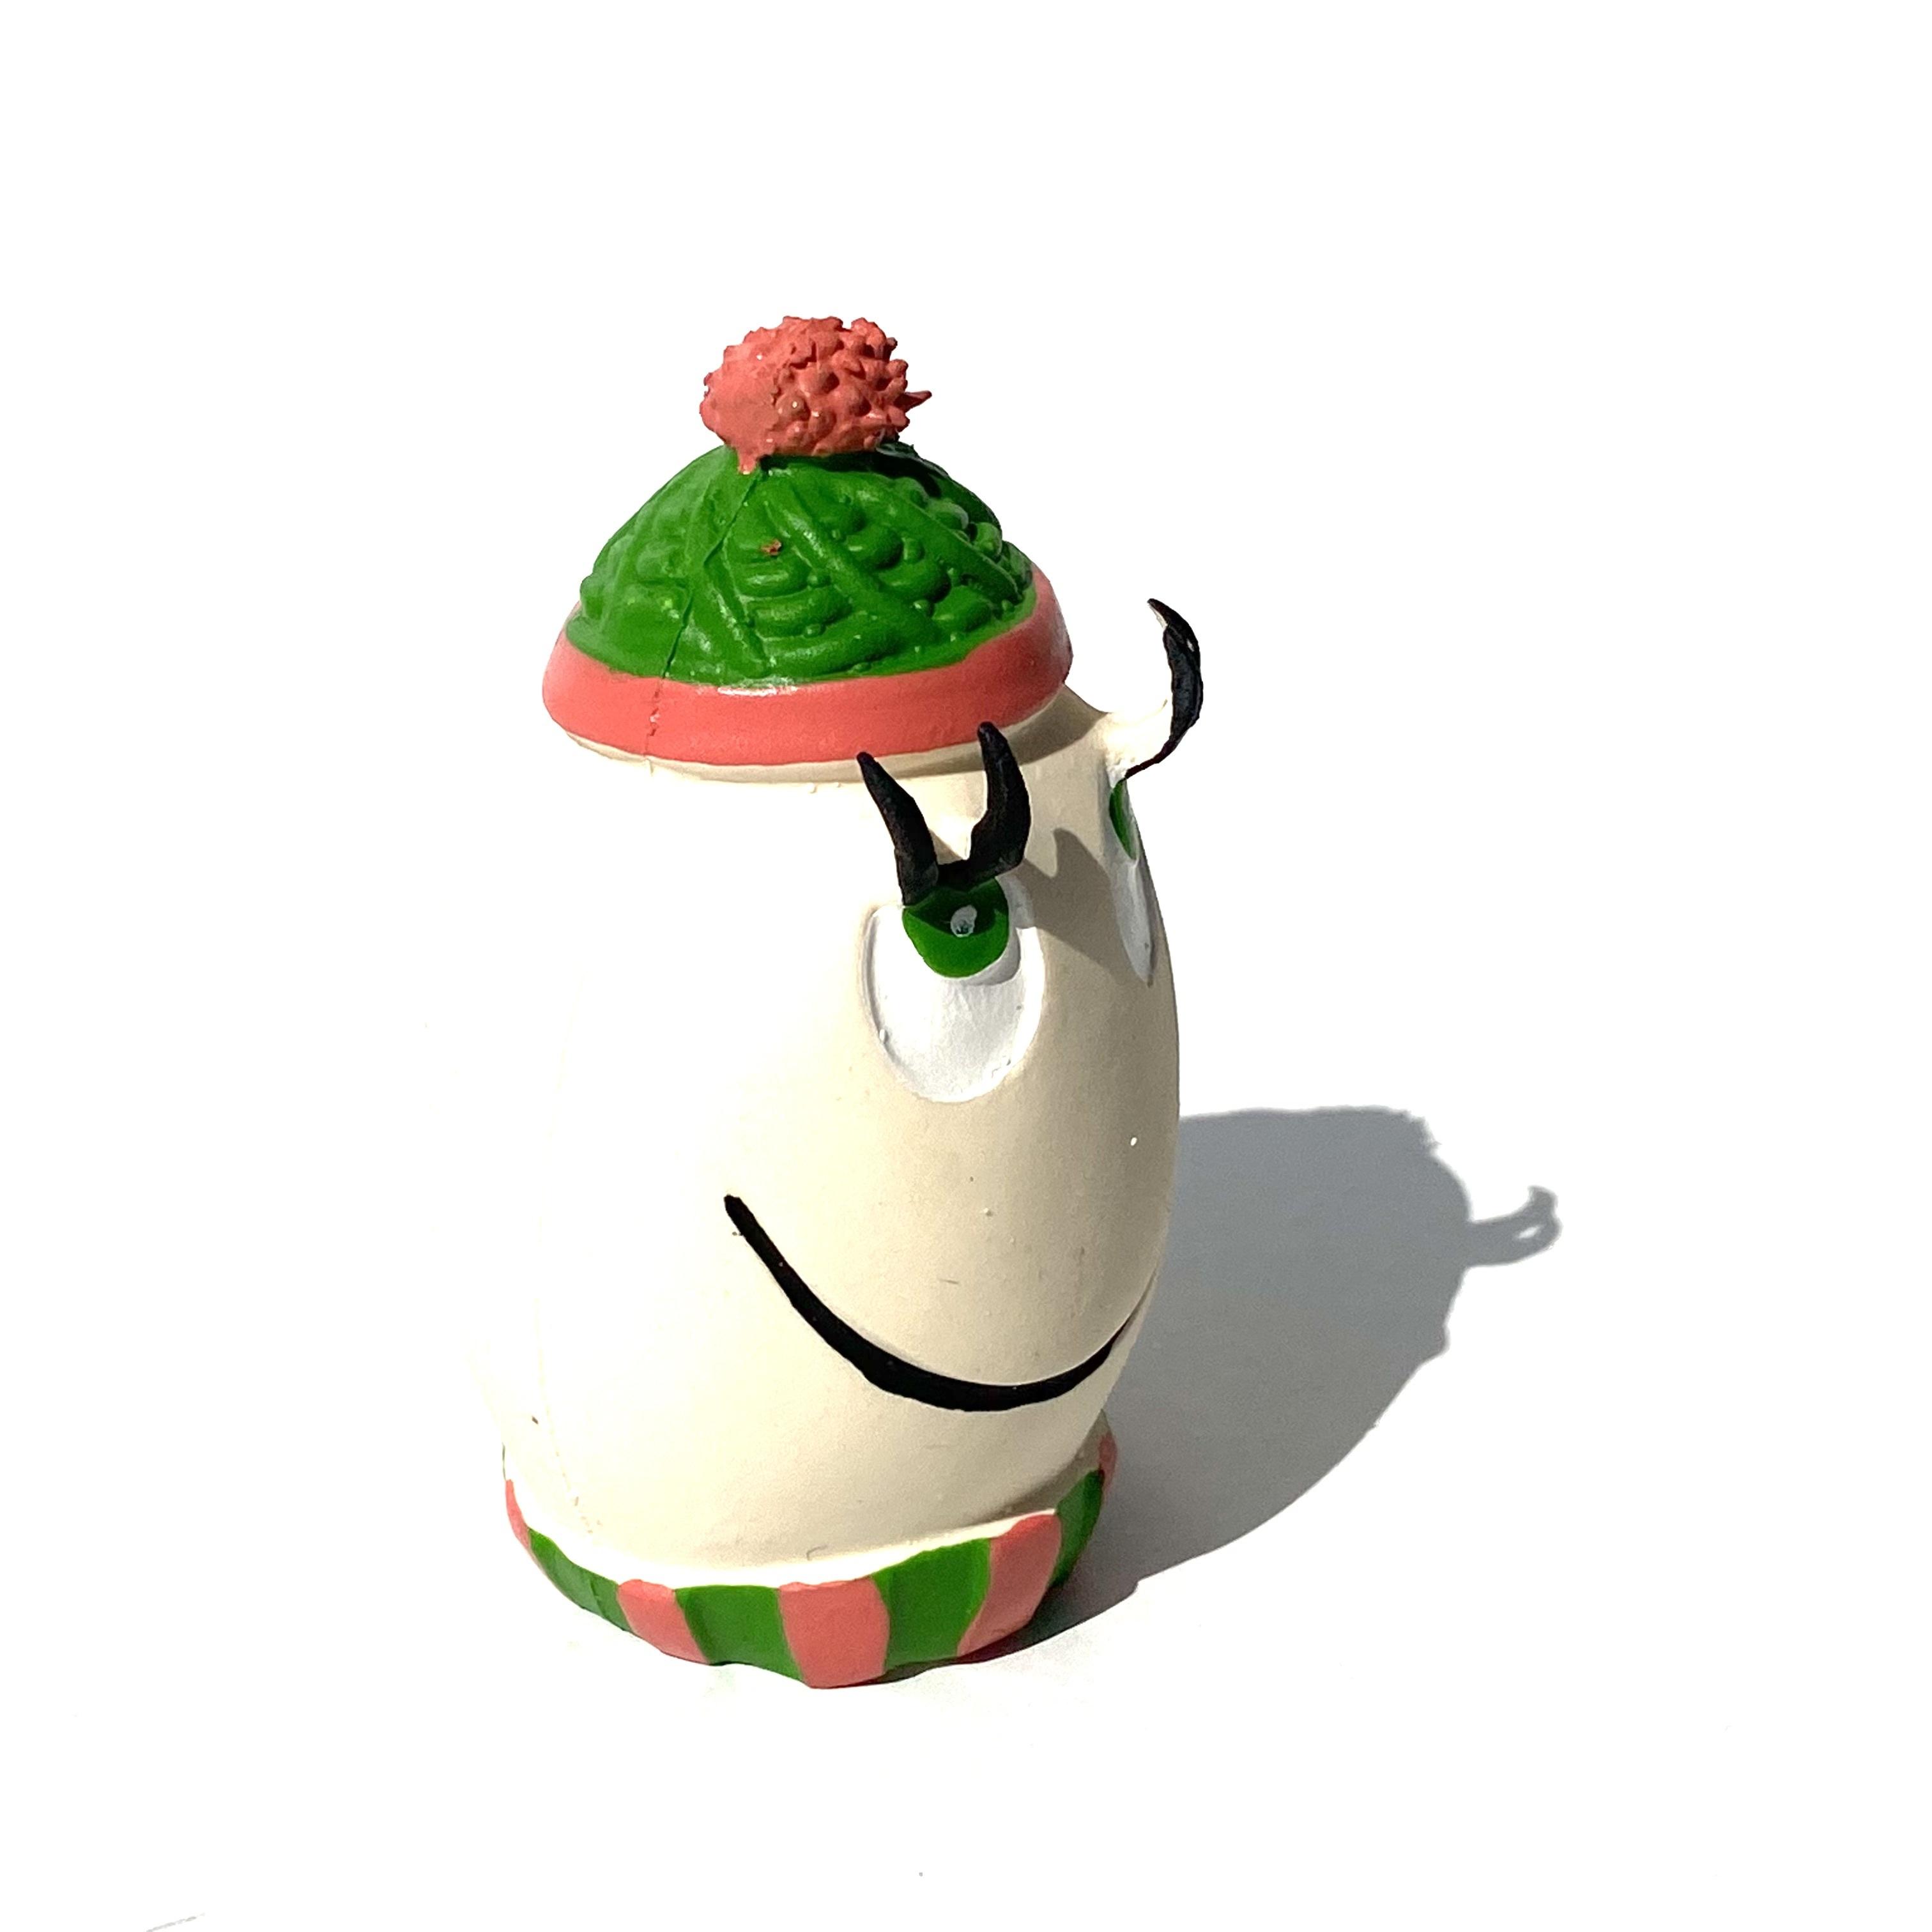 LANCO Winter Egg ランコ ウィンター タマゴ_d0217958_16513603.jpeg